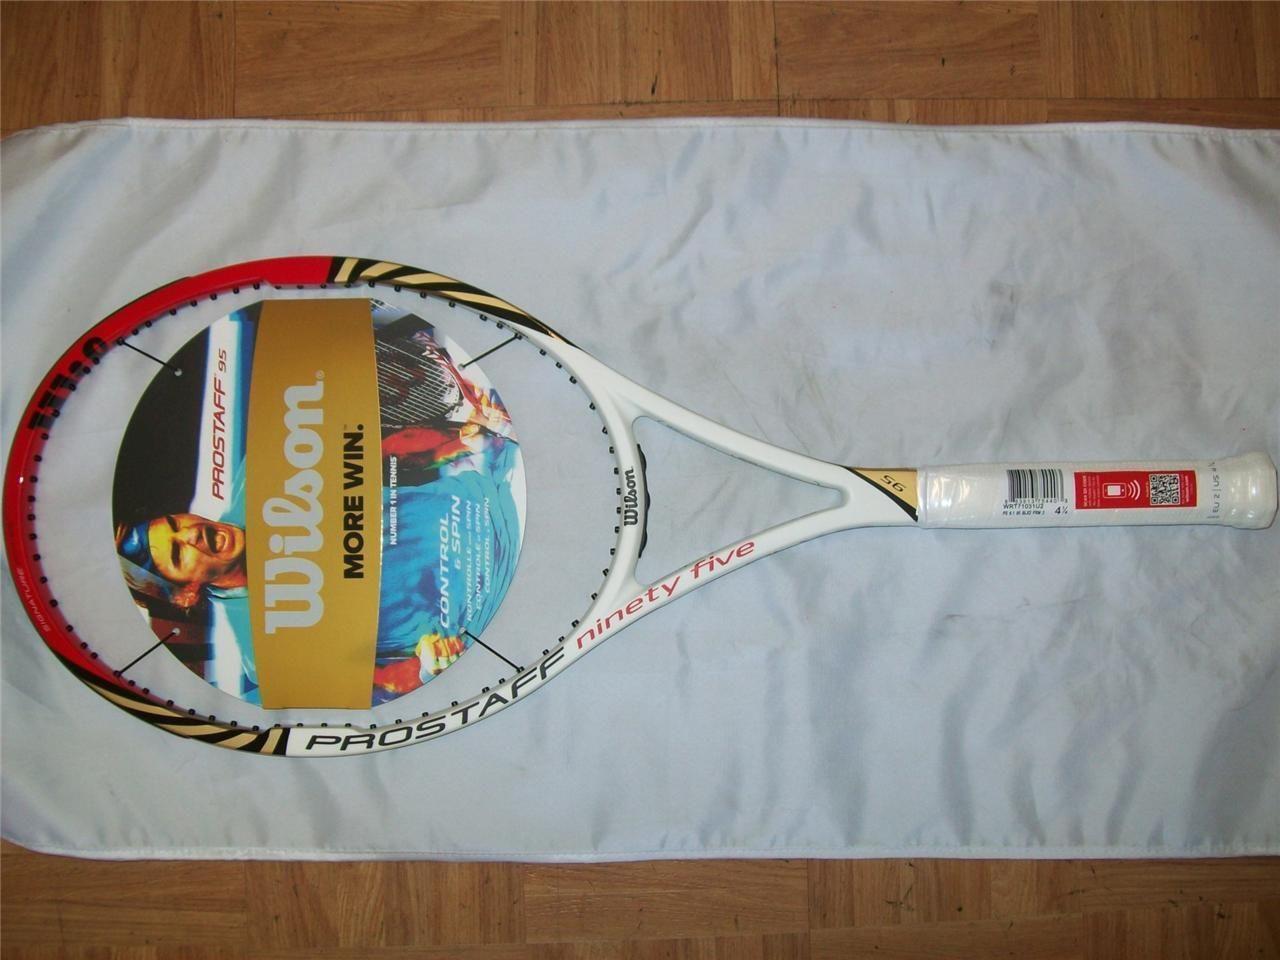 New 2012-2013 Wilson BLX Pro Staff 95 head 4 1 2 grip DIMITROV Tennis Racquet